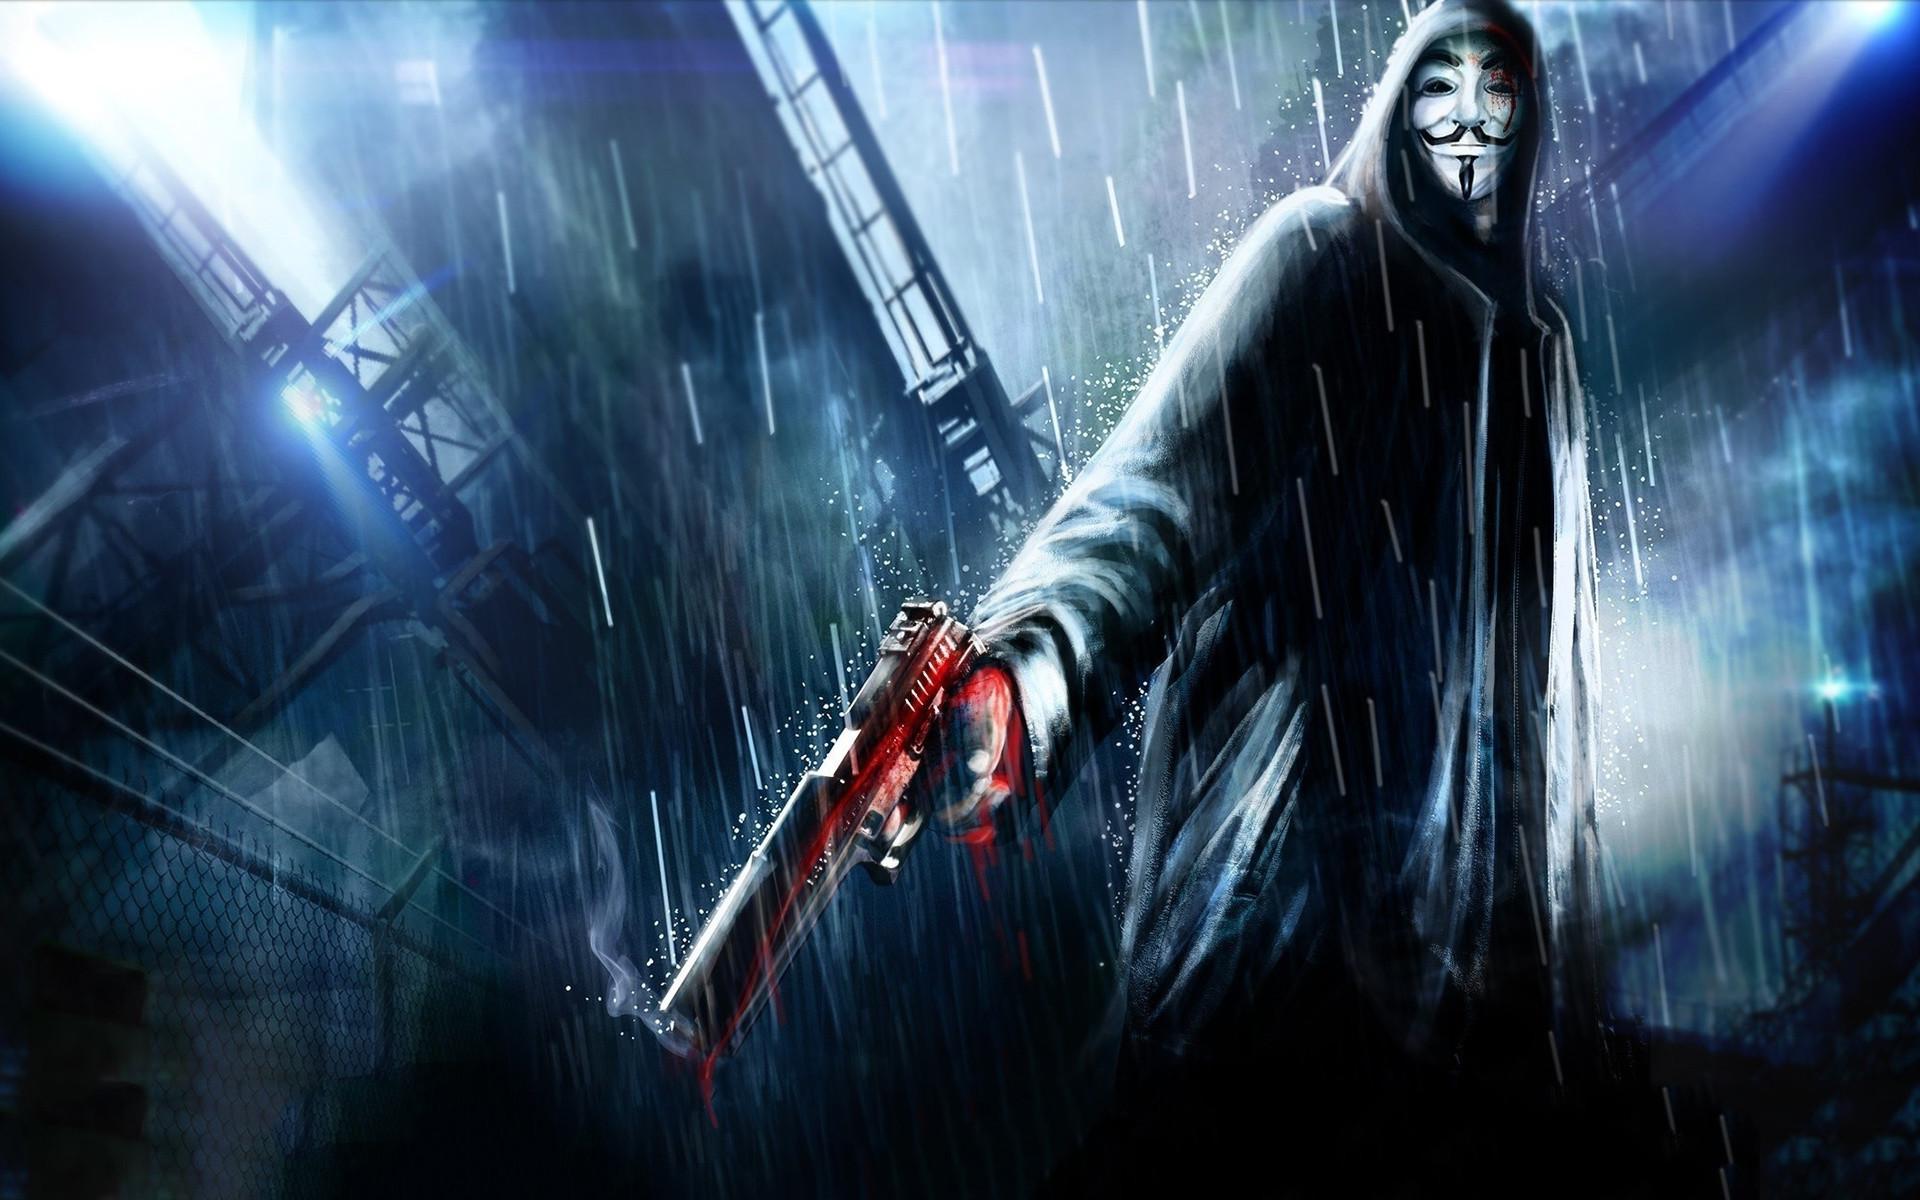 Anonymous, Vendetta, Raining, Pistol